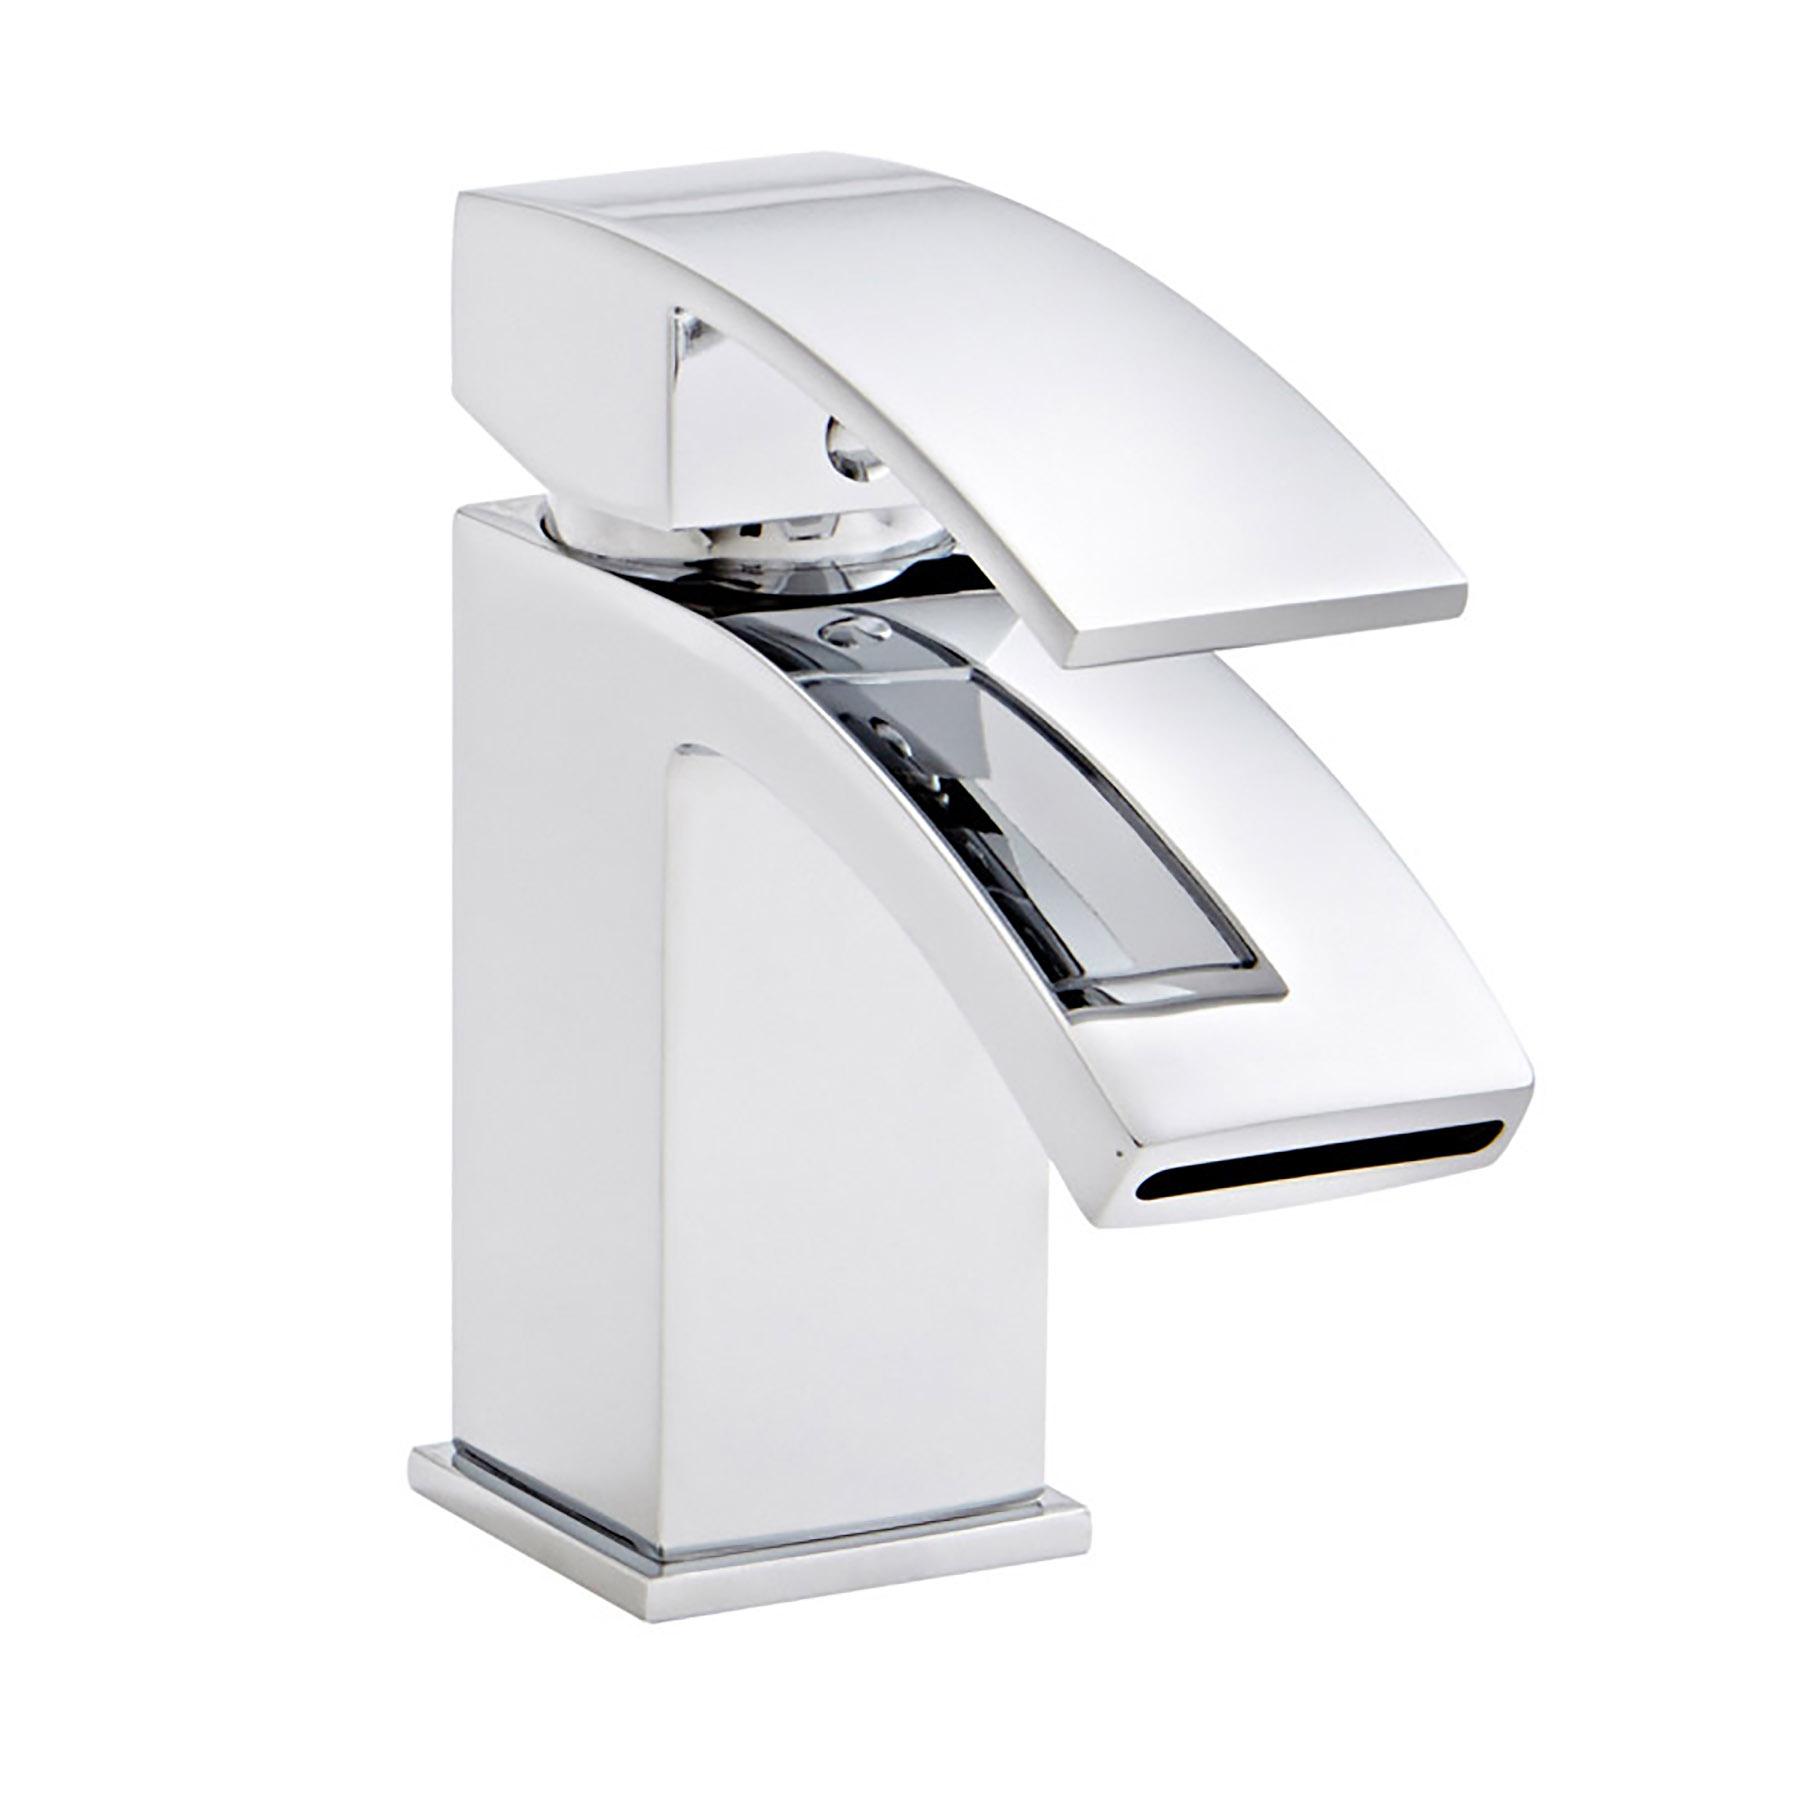 Modern Bathroom Chrome Flair Basin Mixer Sink Bath Filler Shower Tap ...